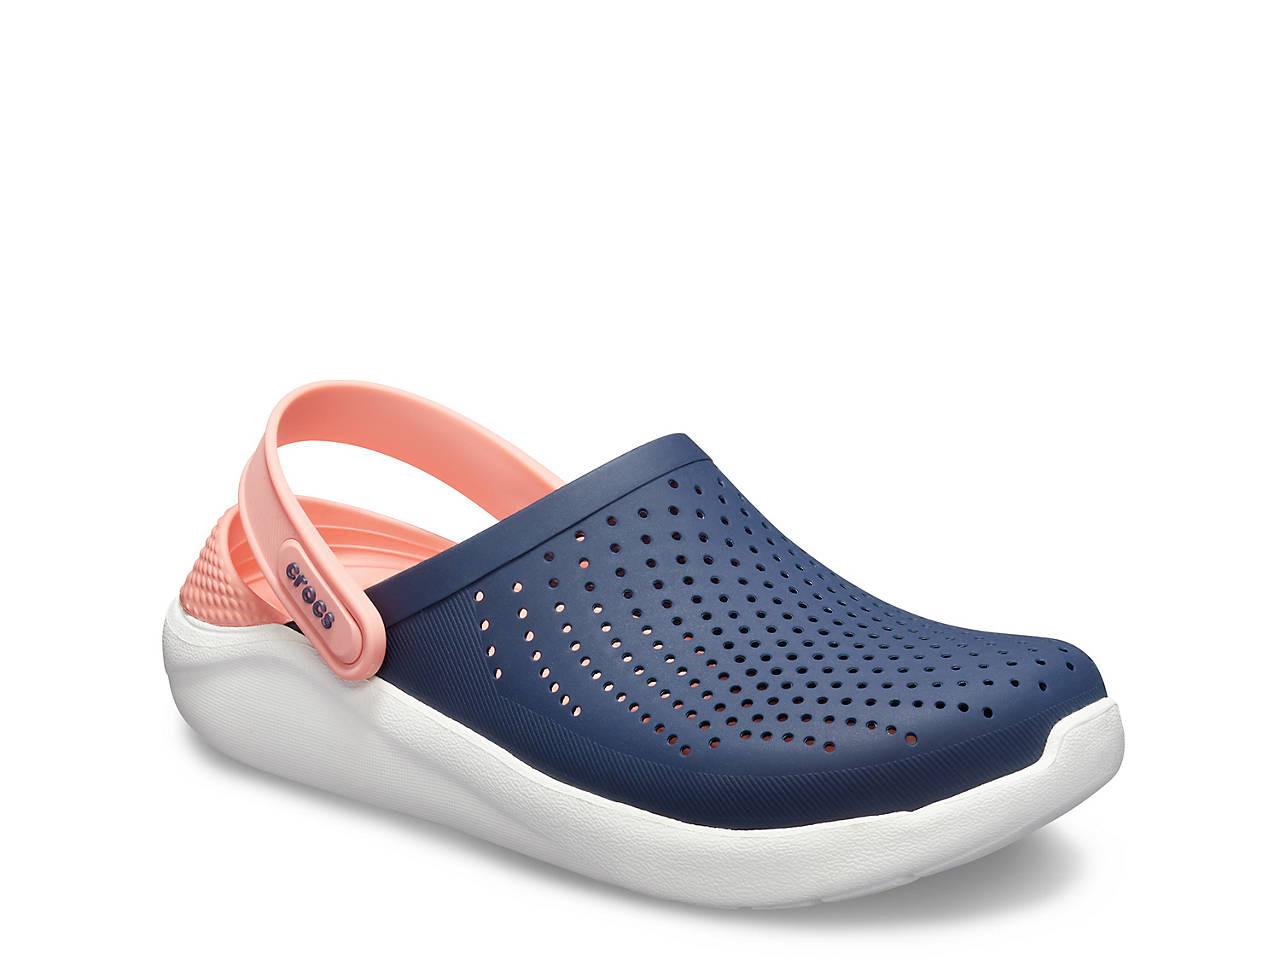 7541b1515 Crocs LiteRide Clog Women s Shoes